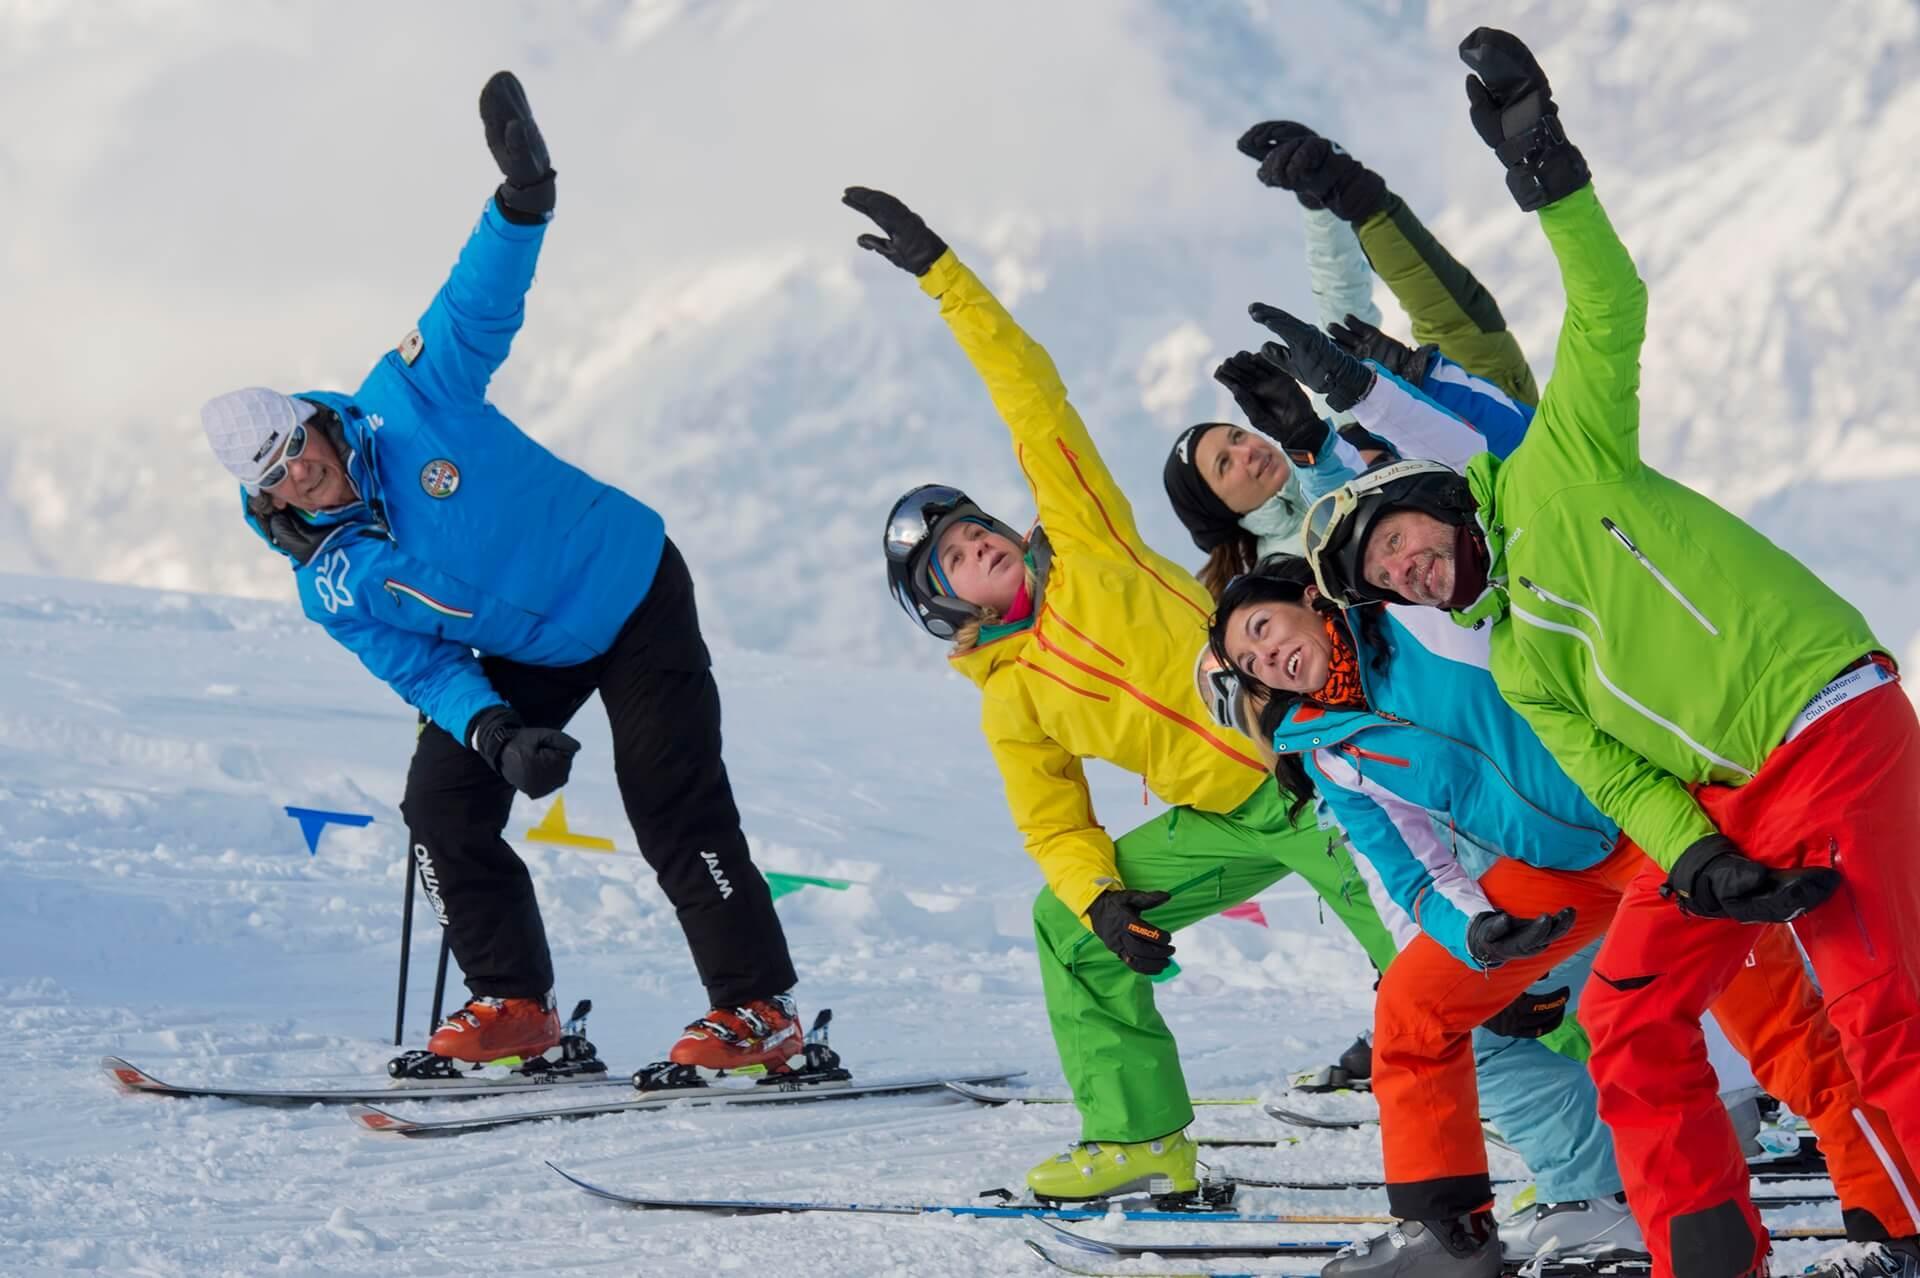 Yoga auf Ski